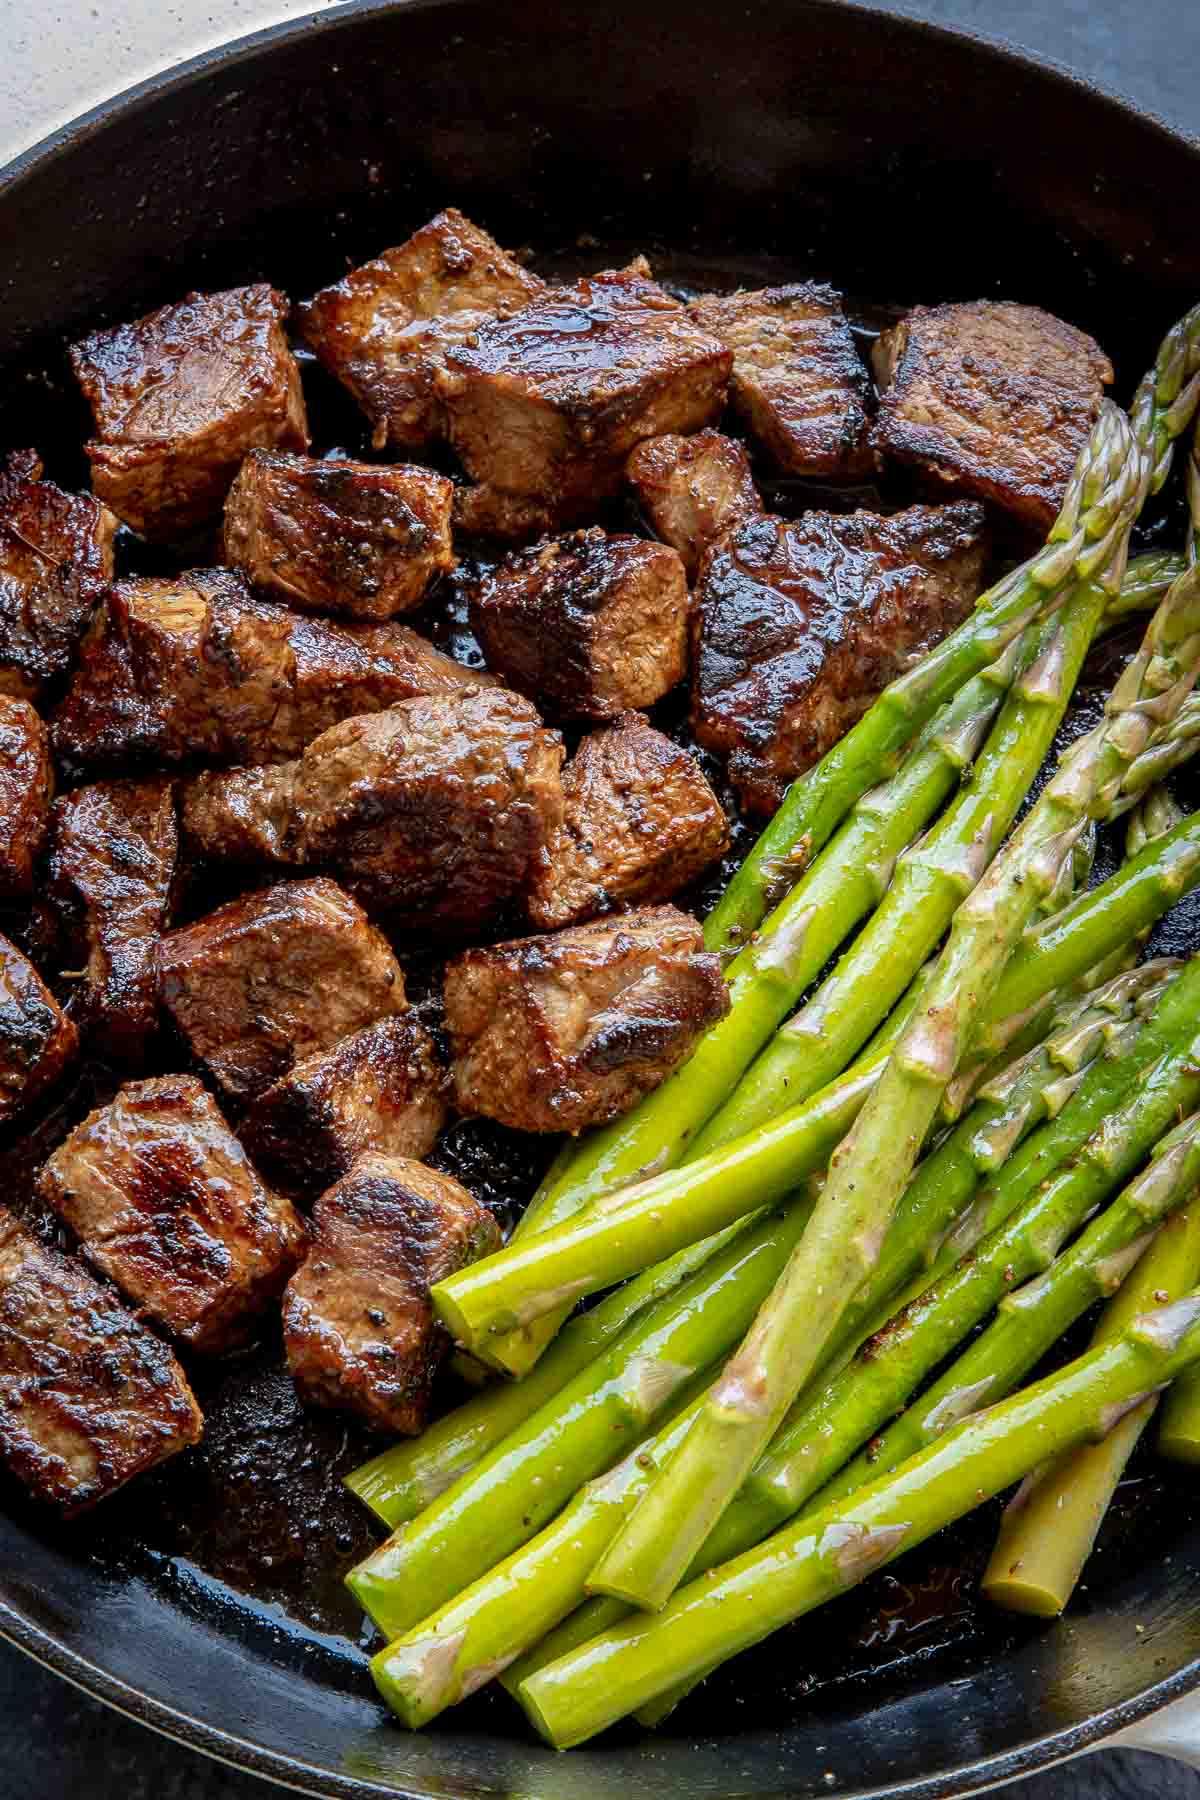 Steak Bites With Chimichurri Sauce Let The Baking Begin